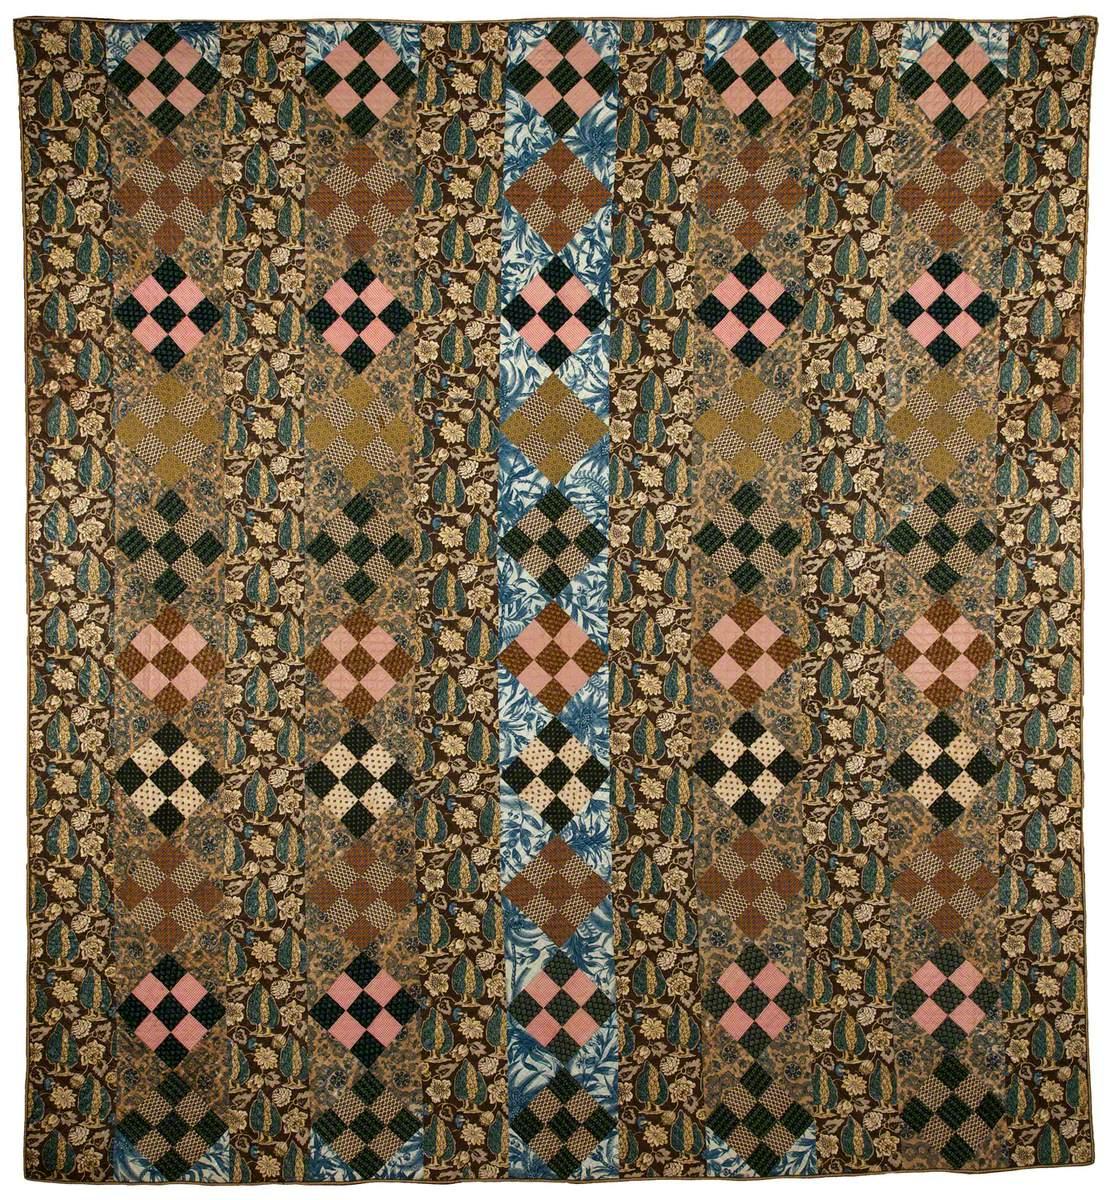 Nine-Patch Strip Quilt